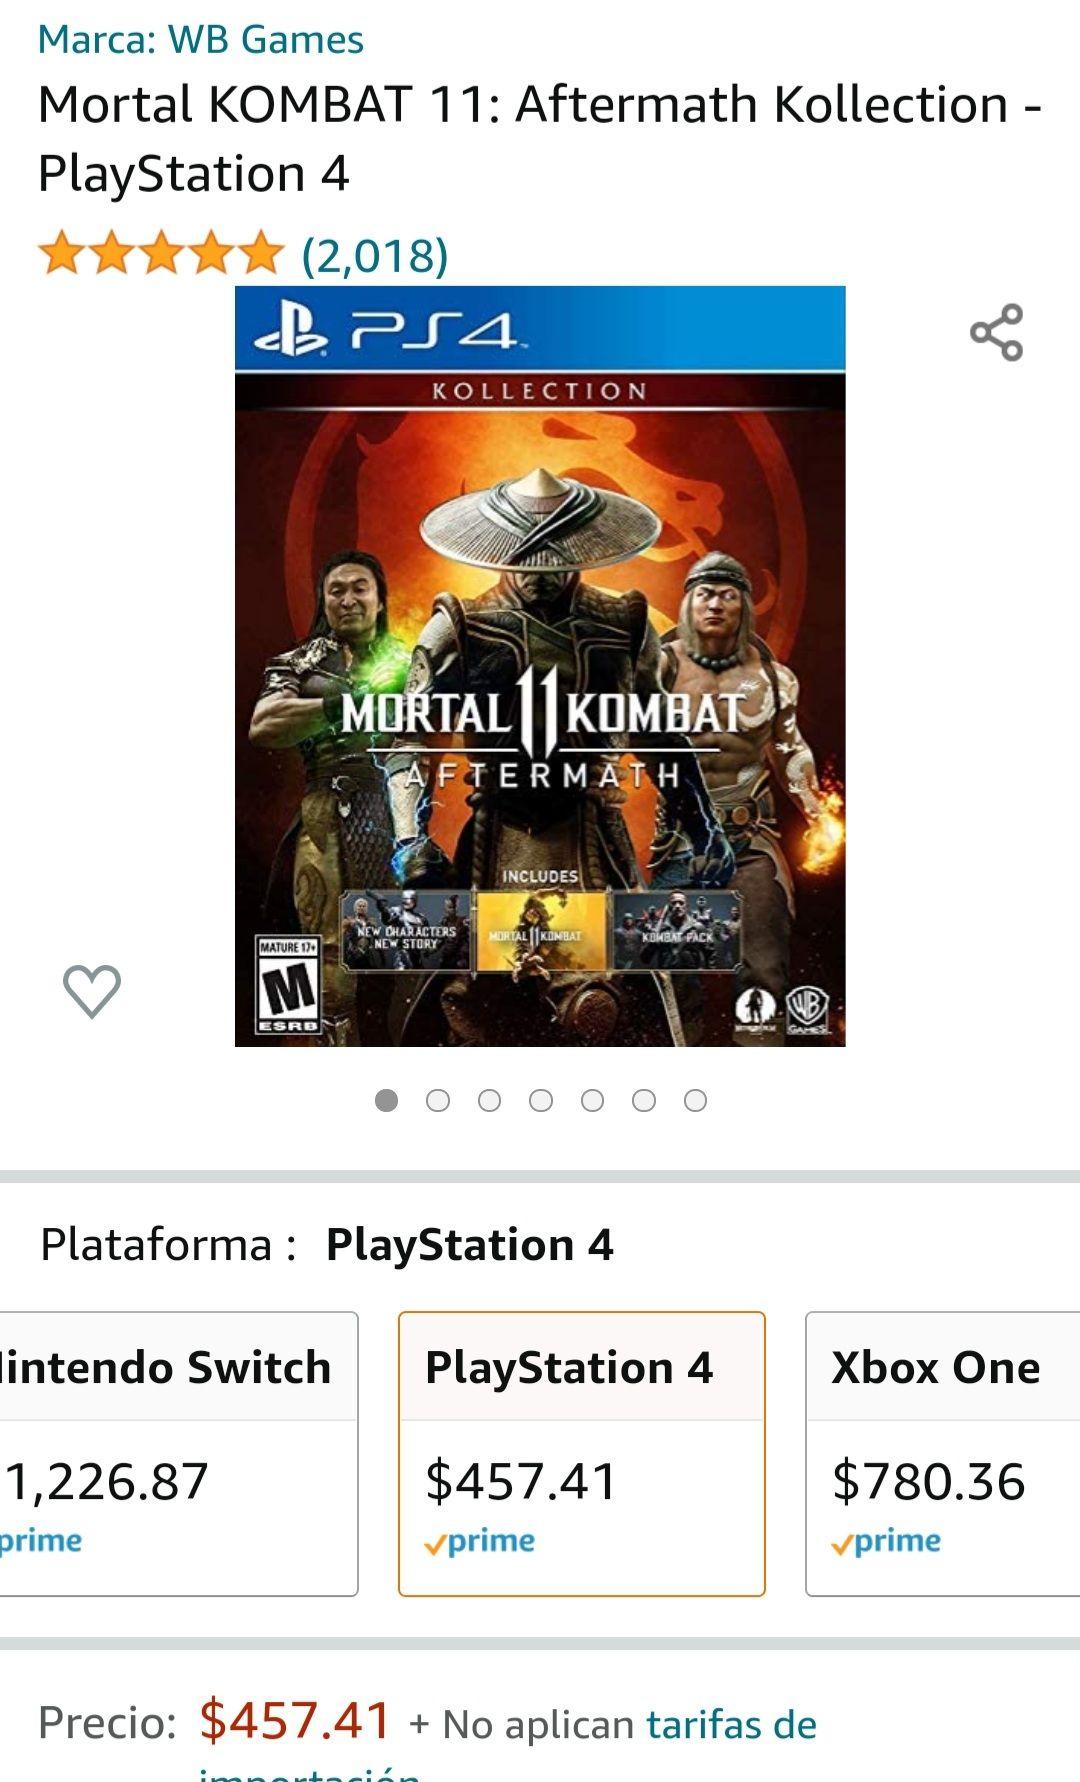 Amazon: Mortal KOMBAT 11: Aftermath Kollection - PlayStation 4